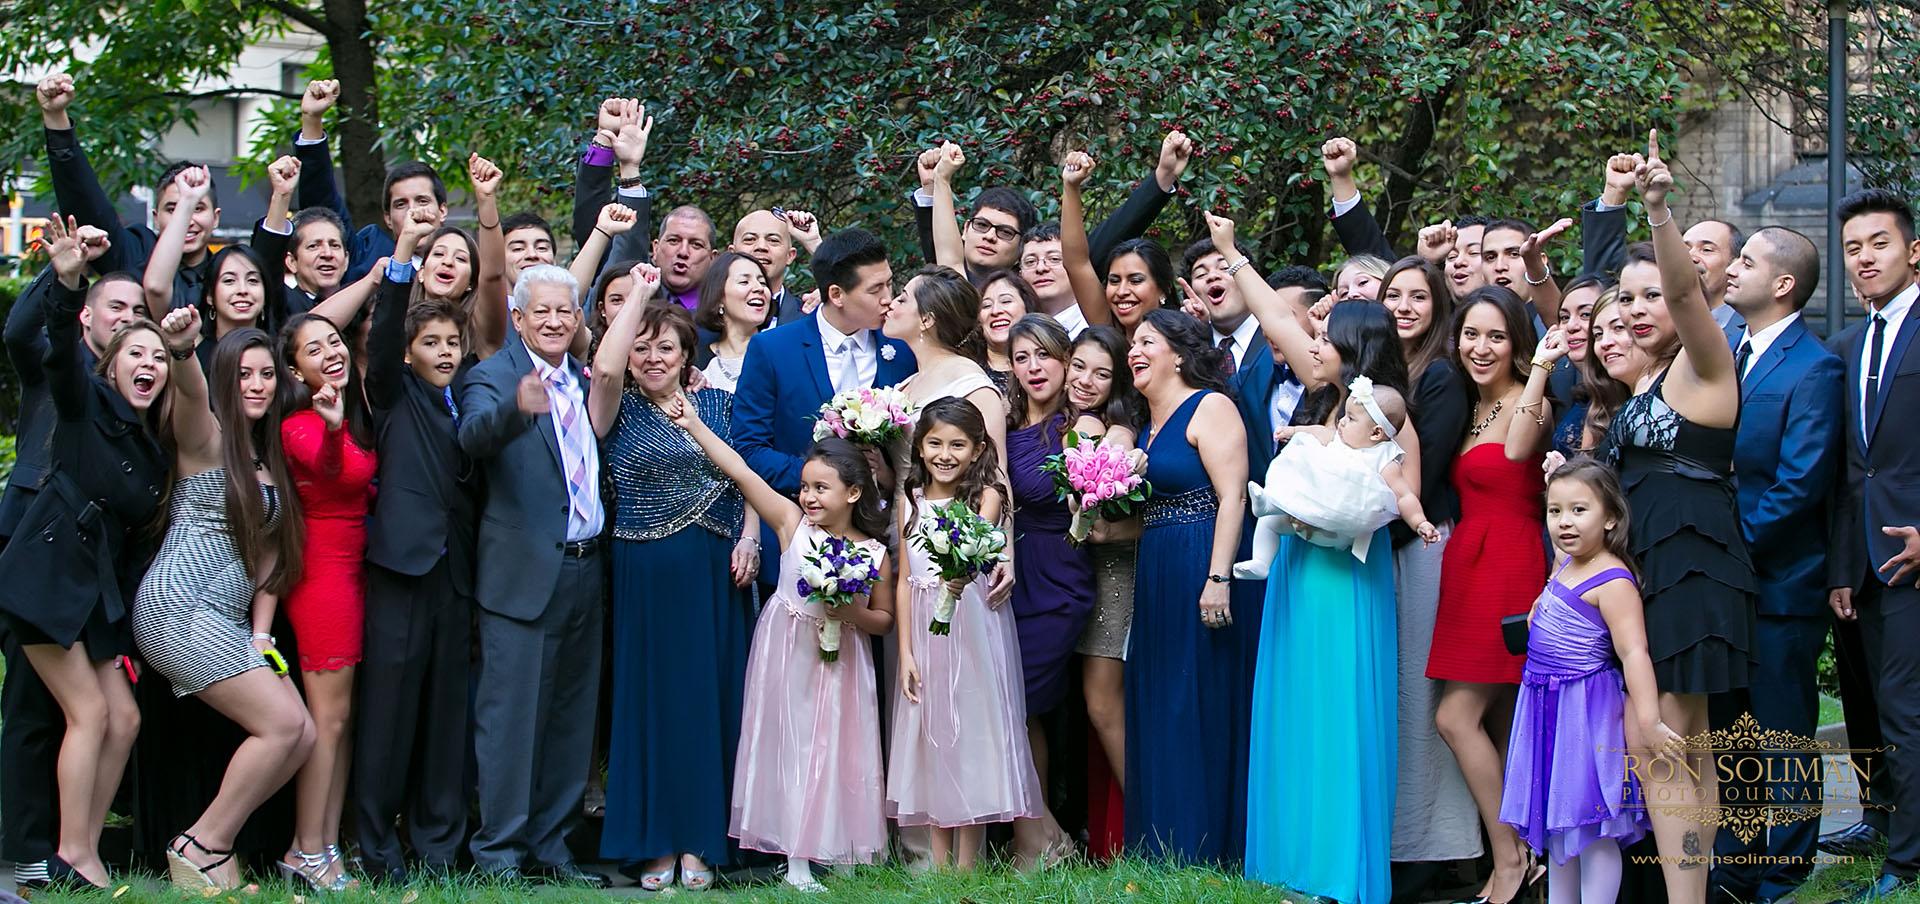 LIGHTHOUSE CHELSEA PIERS WEDDING 17